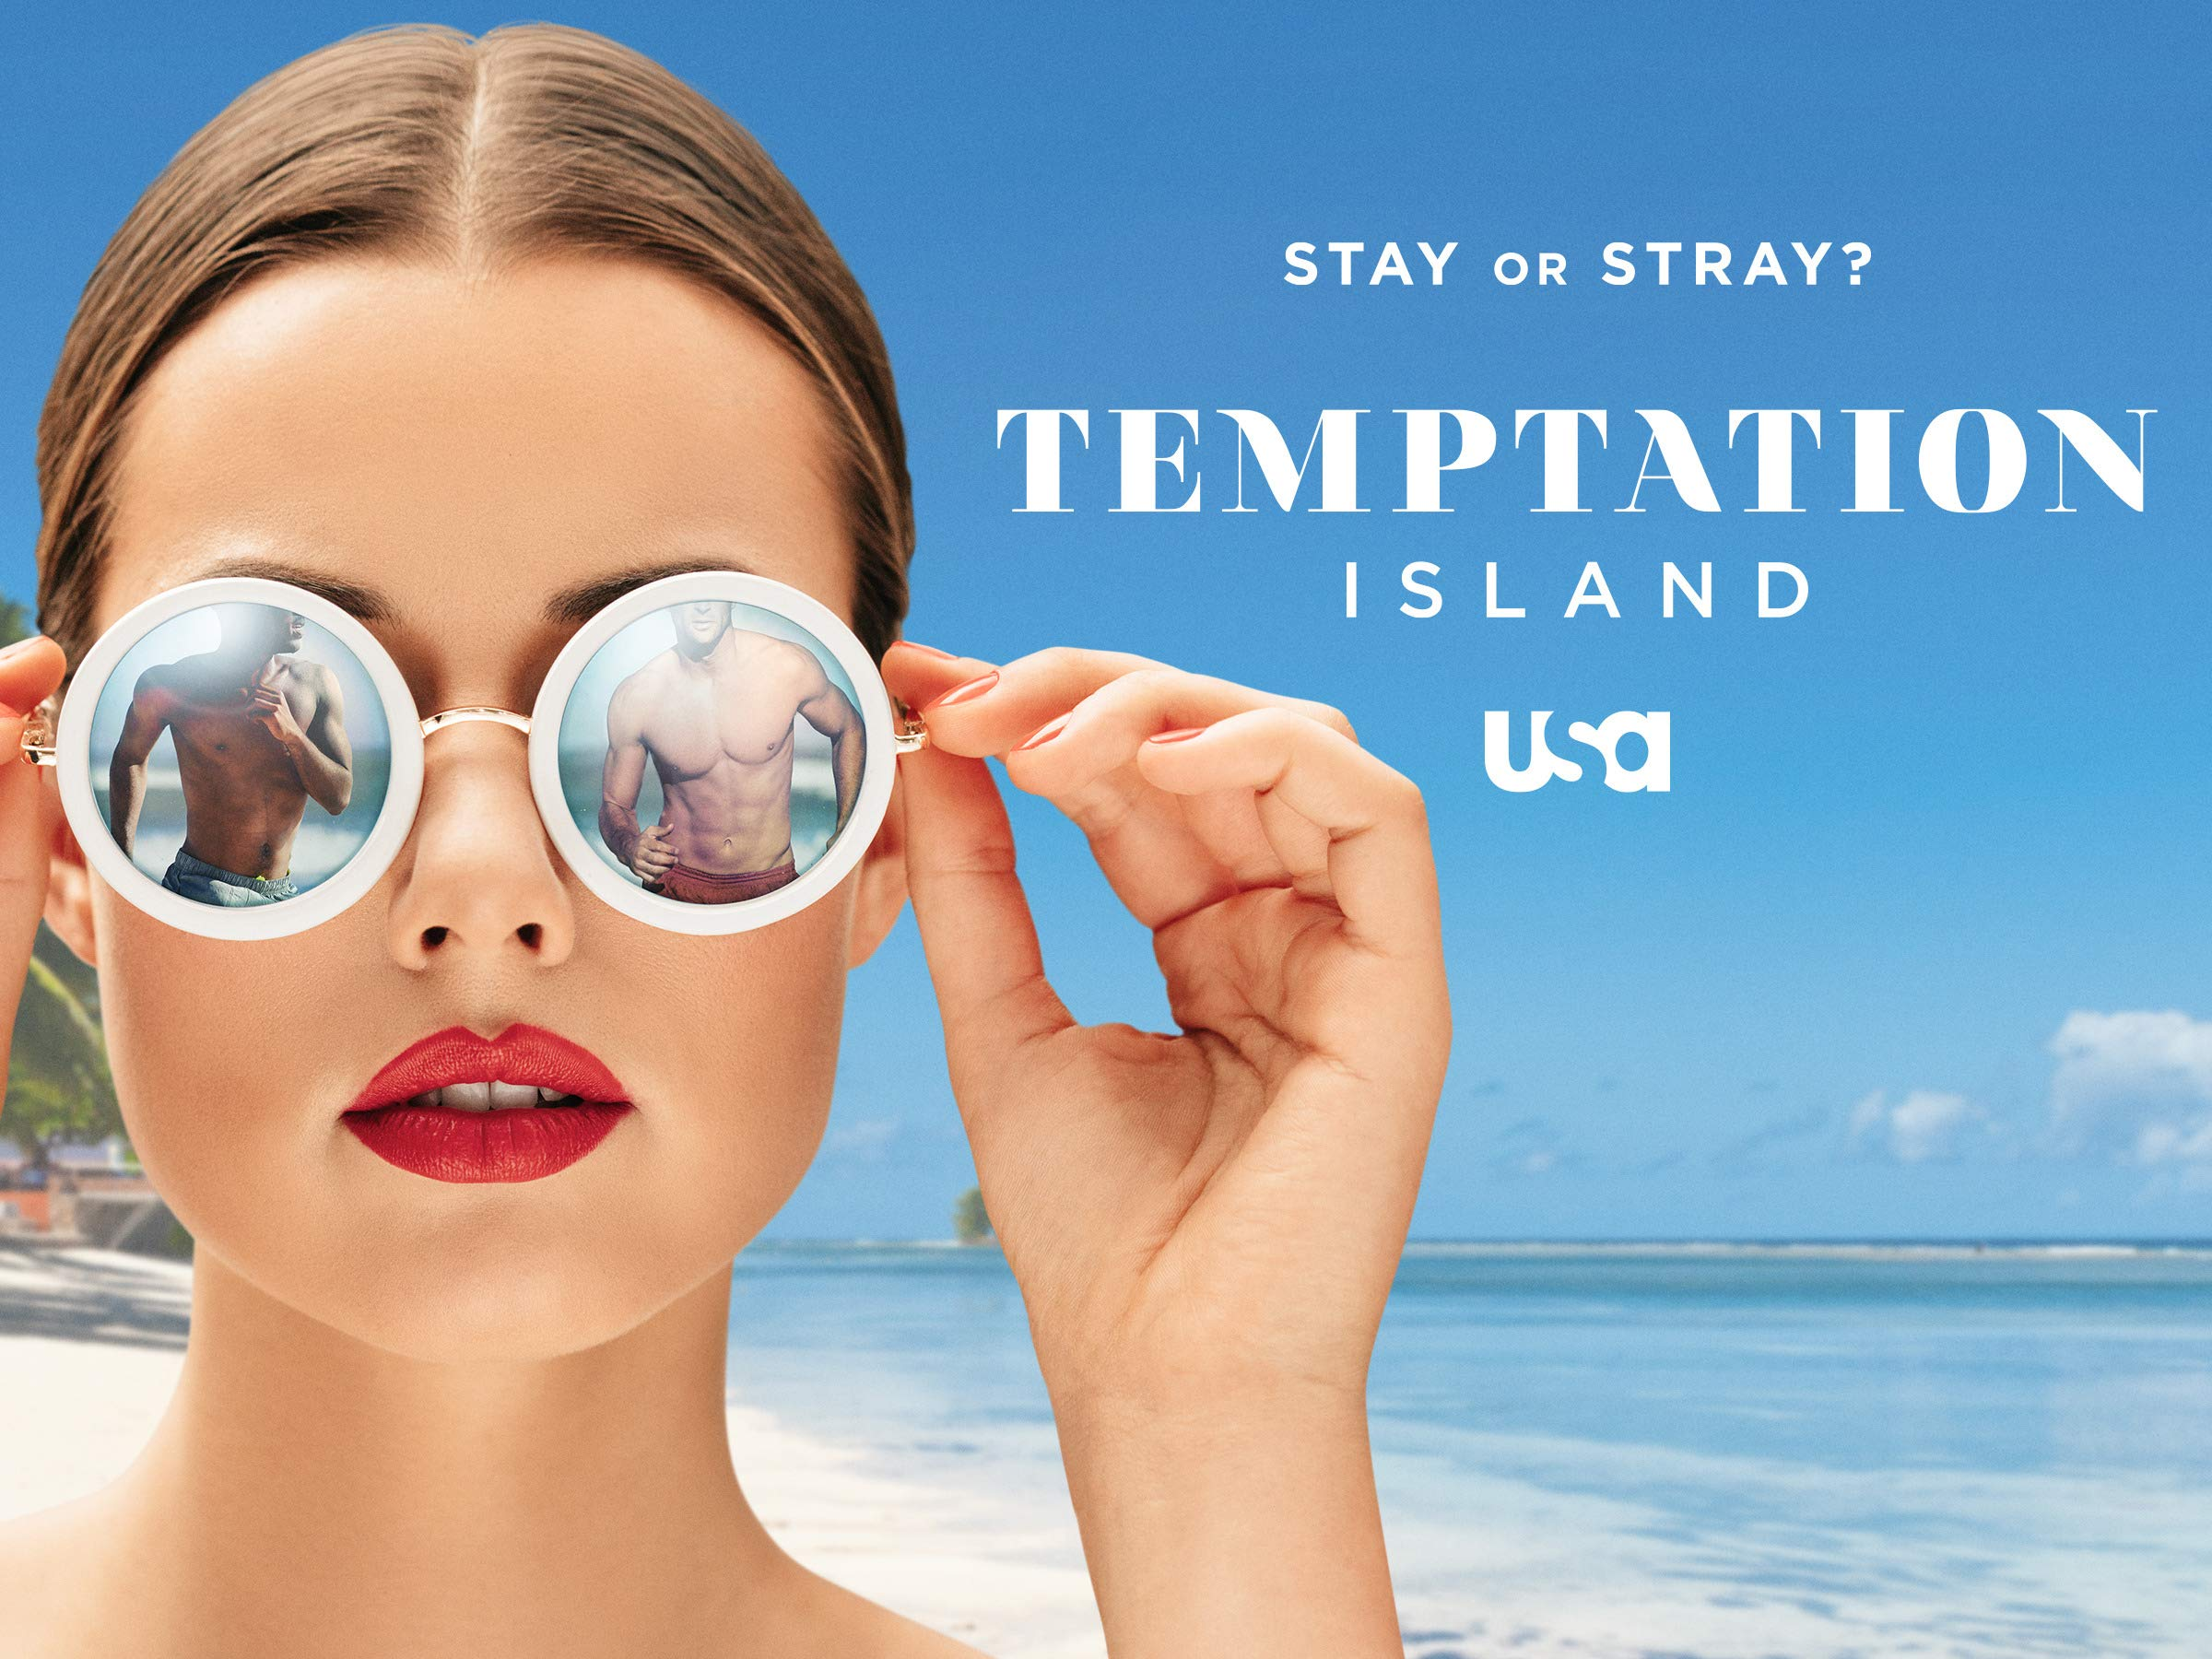 Finale temptation island 2020